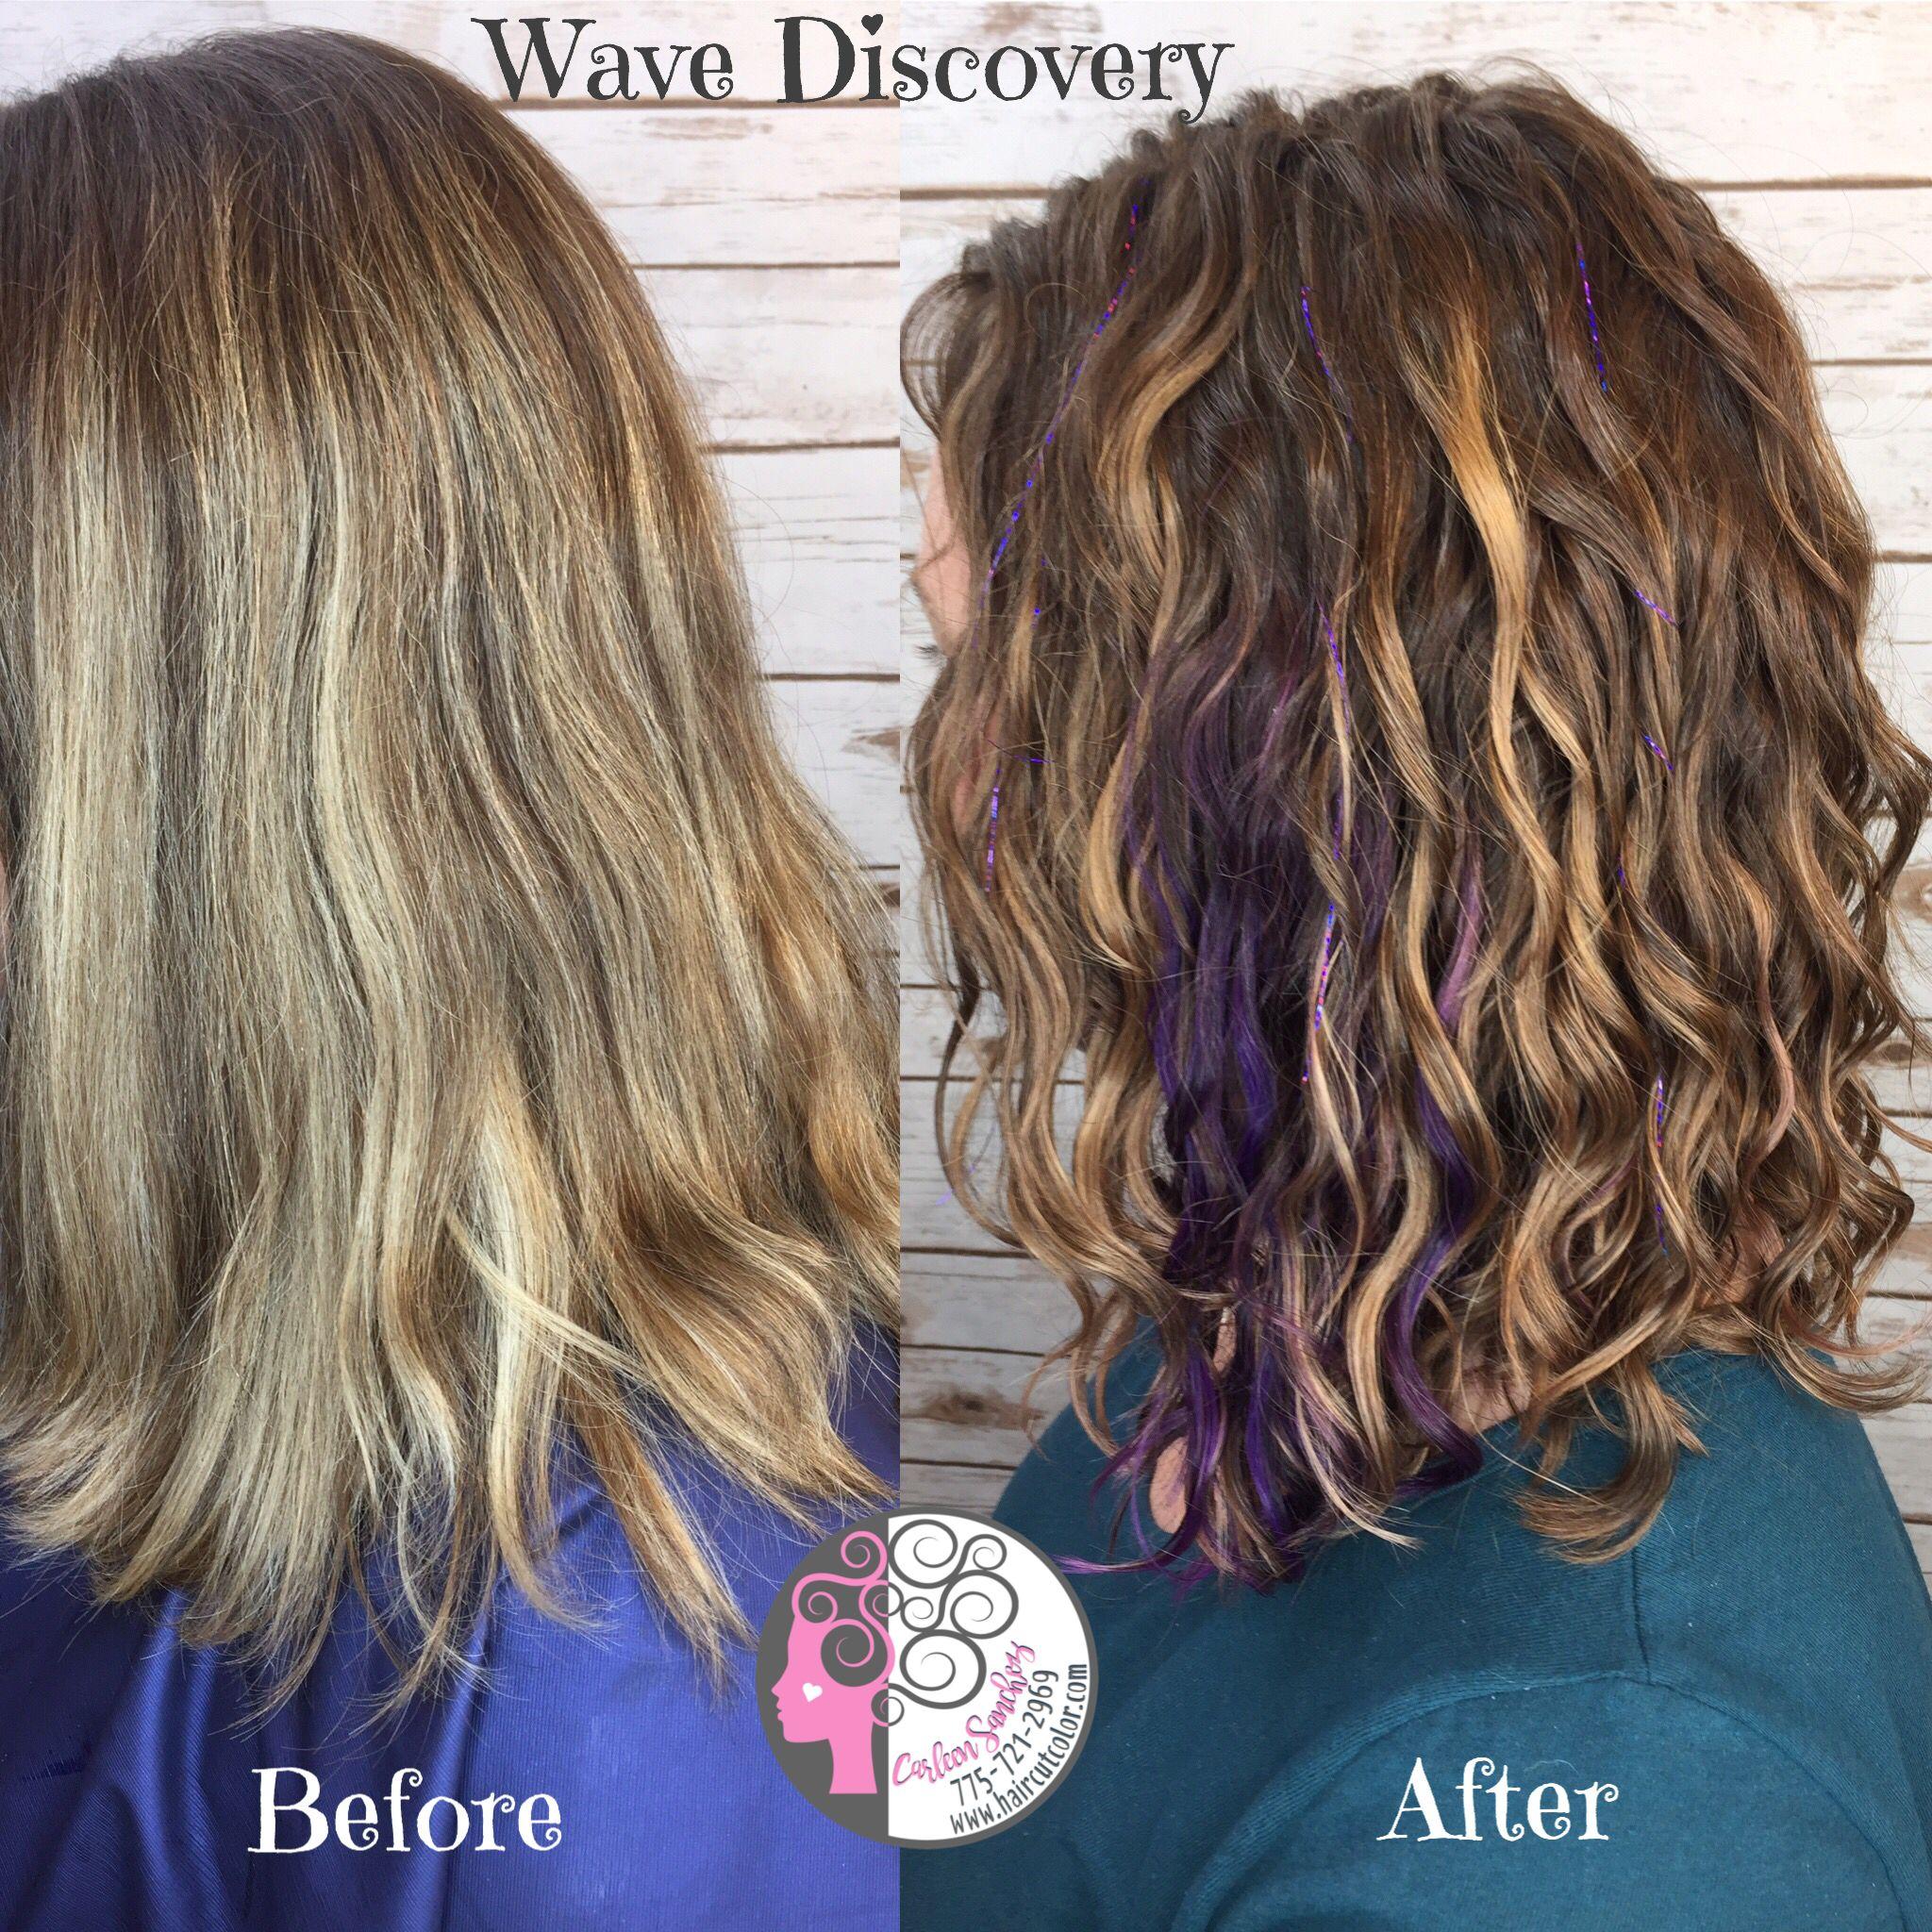 Naturally Curly Purple Panels Highlights Bronde Hair By Carleen Sanchez Nevada S Curl Anti Aging Colo Natural Wavy Hair Haircuts For Curly Hair Wavy Haircuts